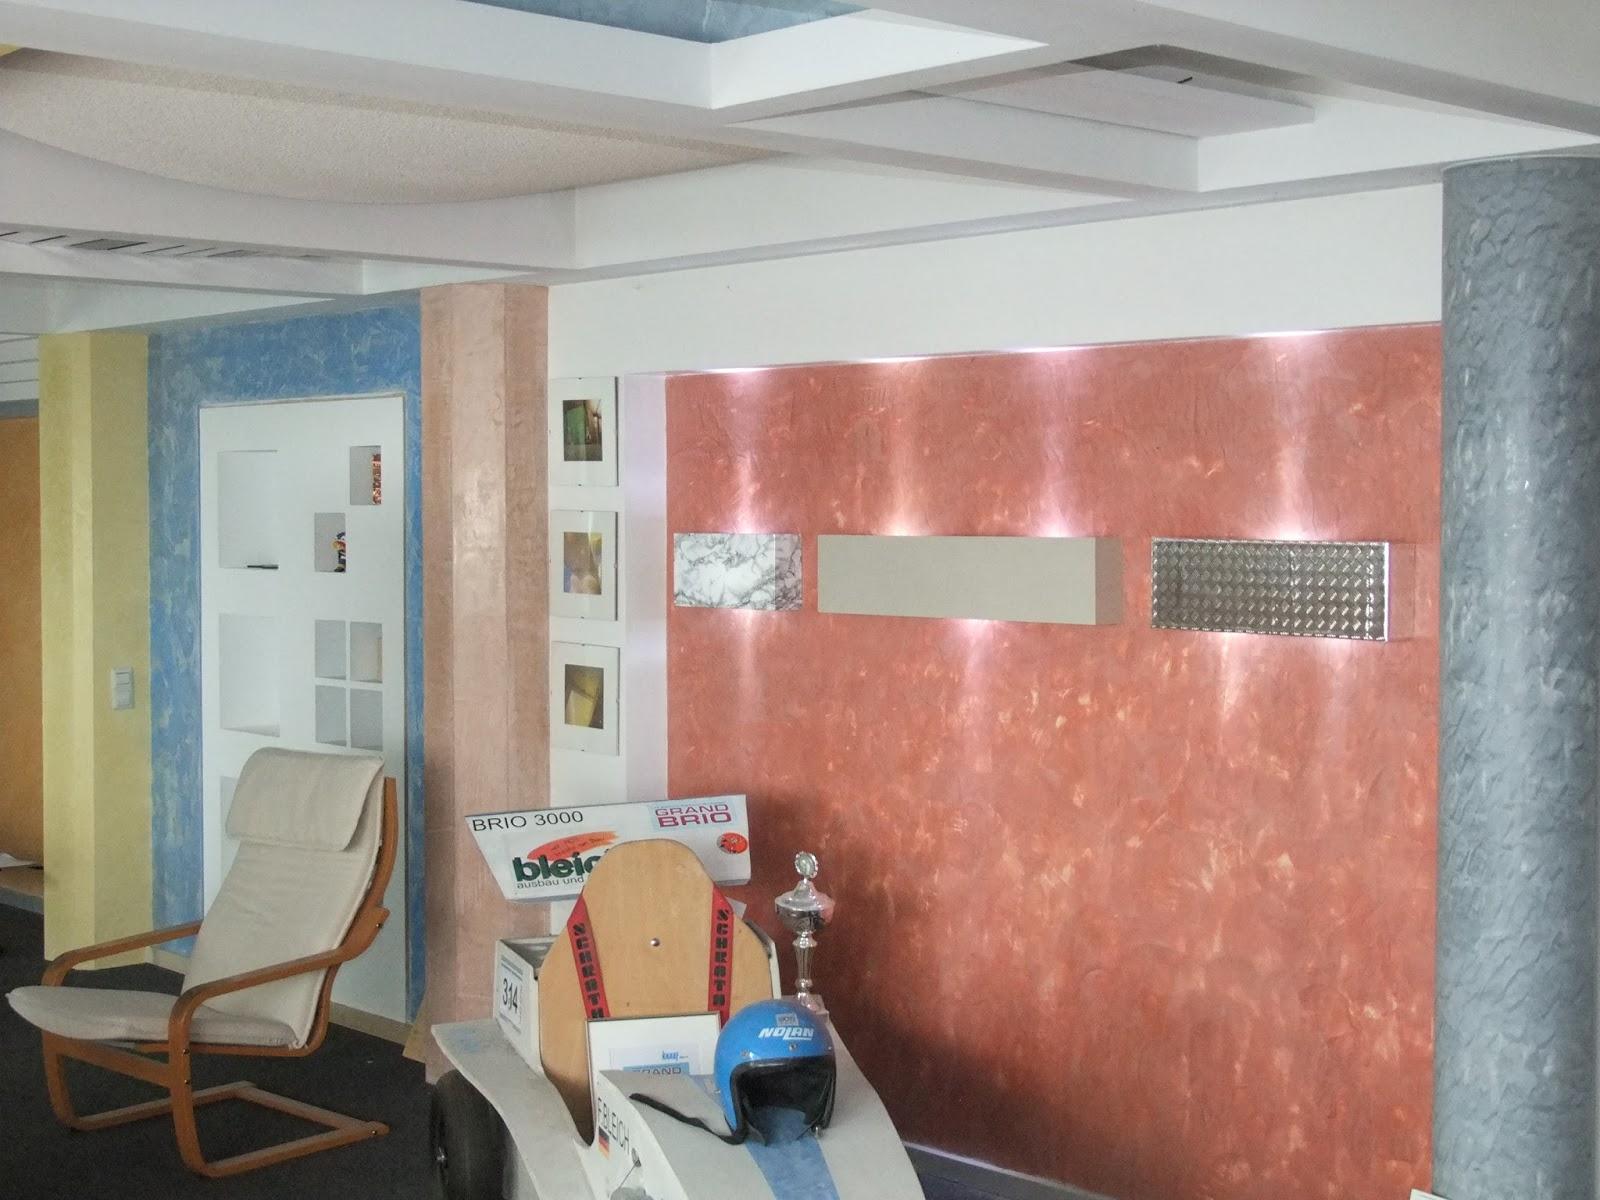 neue wandleuchte bei bleich wandleuchte f r. Black Bedroom Furniture Sets. Home Design Ideas